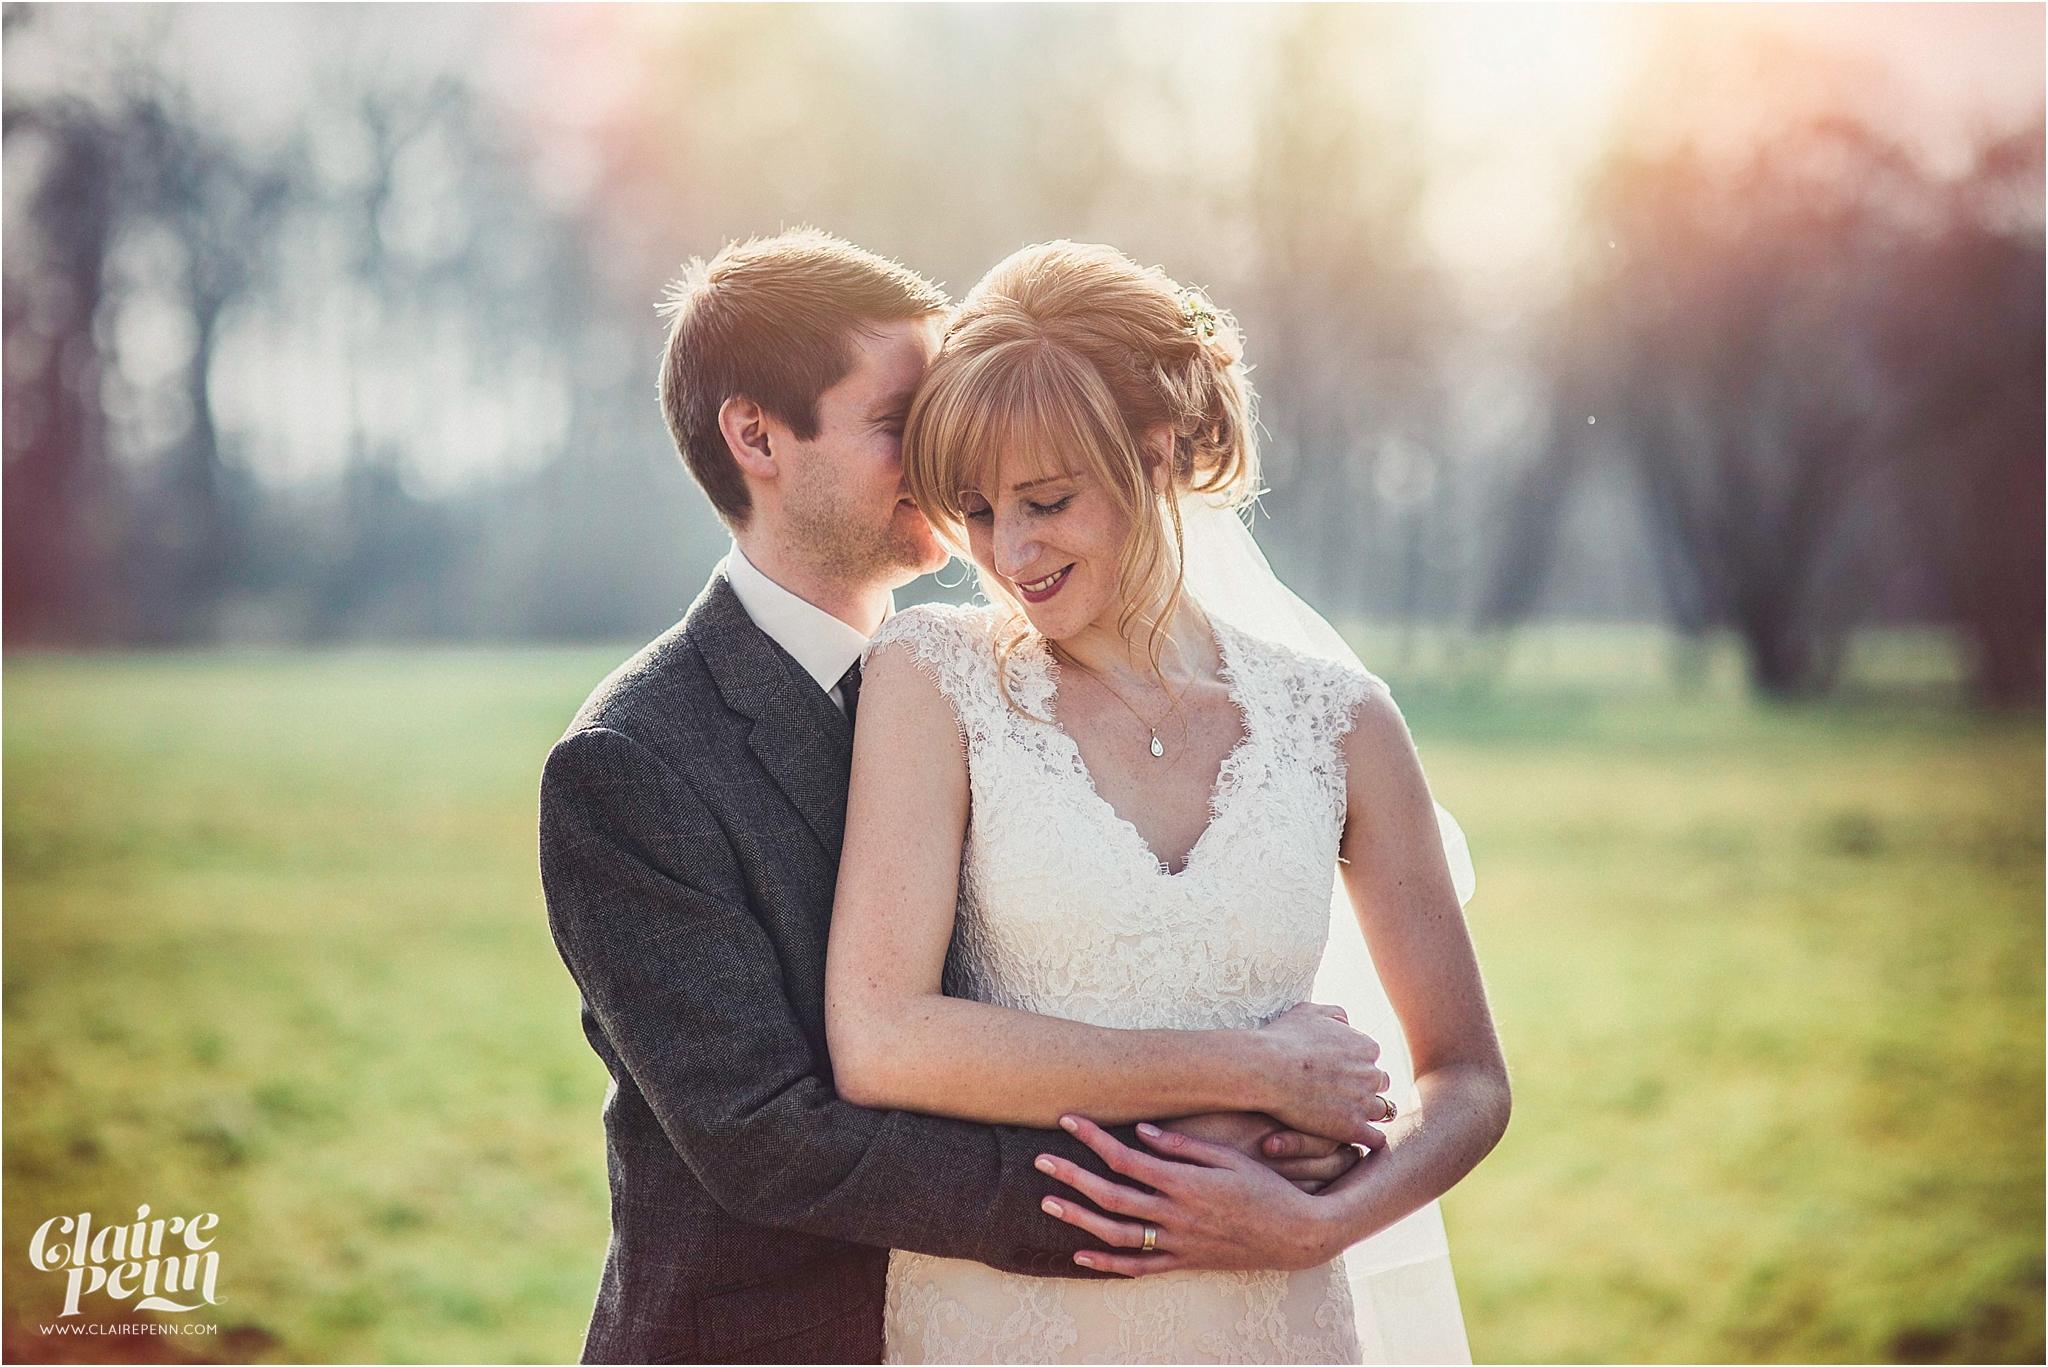 Iscoyd Park wedding, Whitchurch, Cheshire wedding photographer_0034.jpg